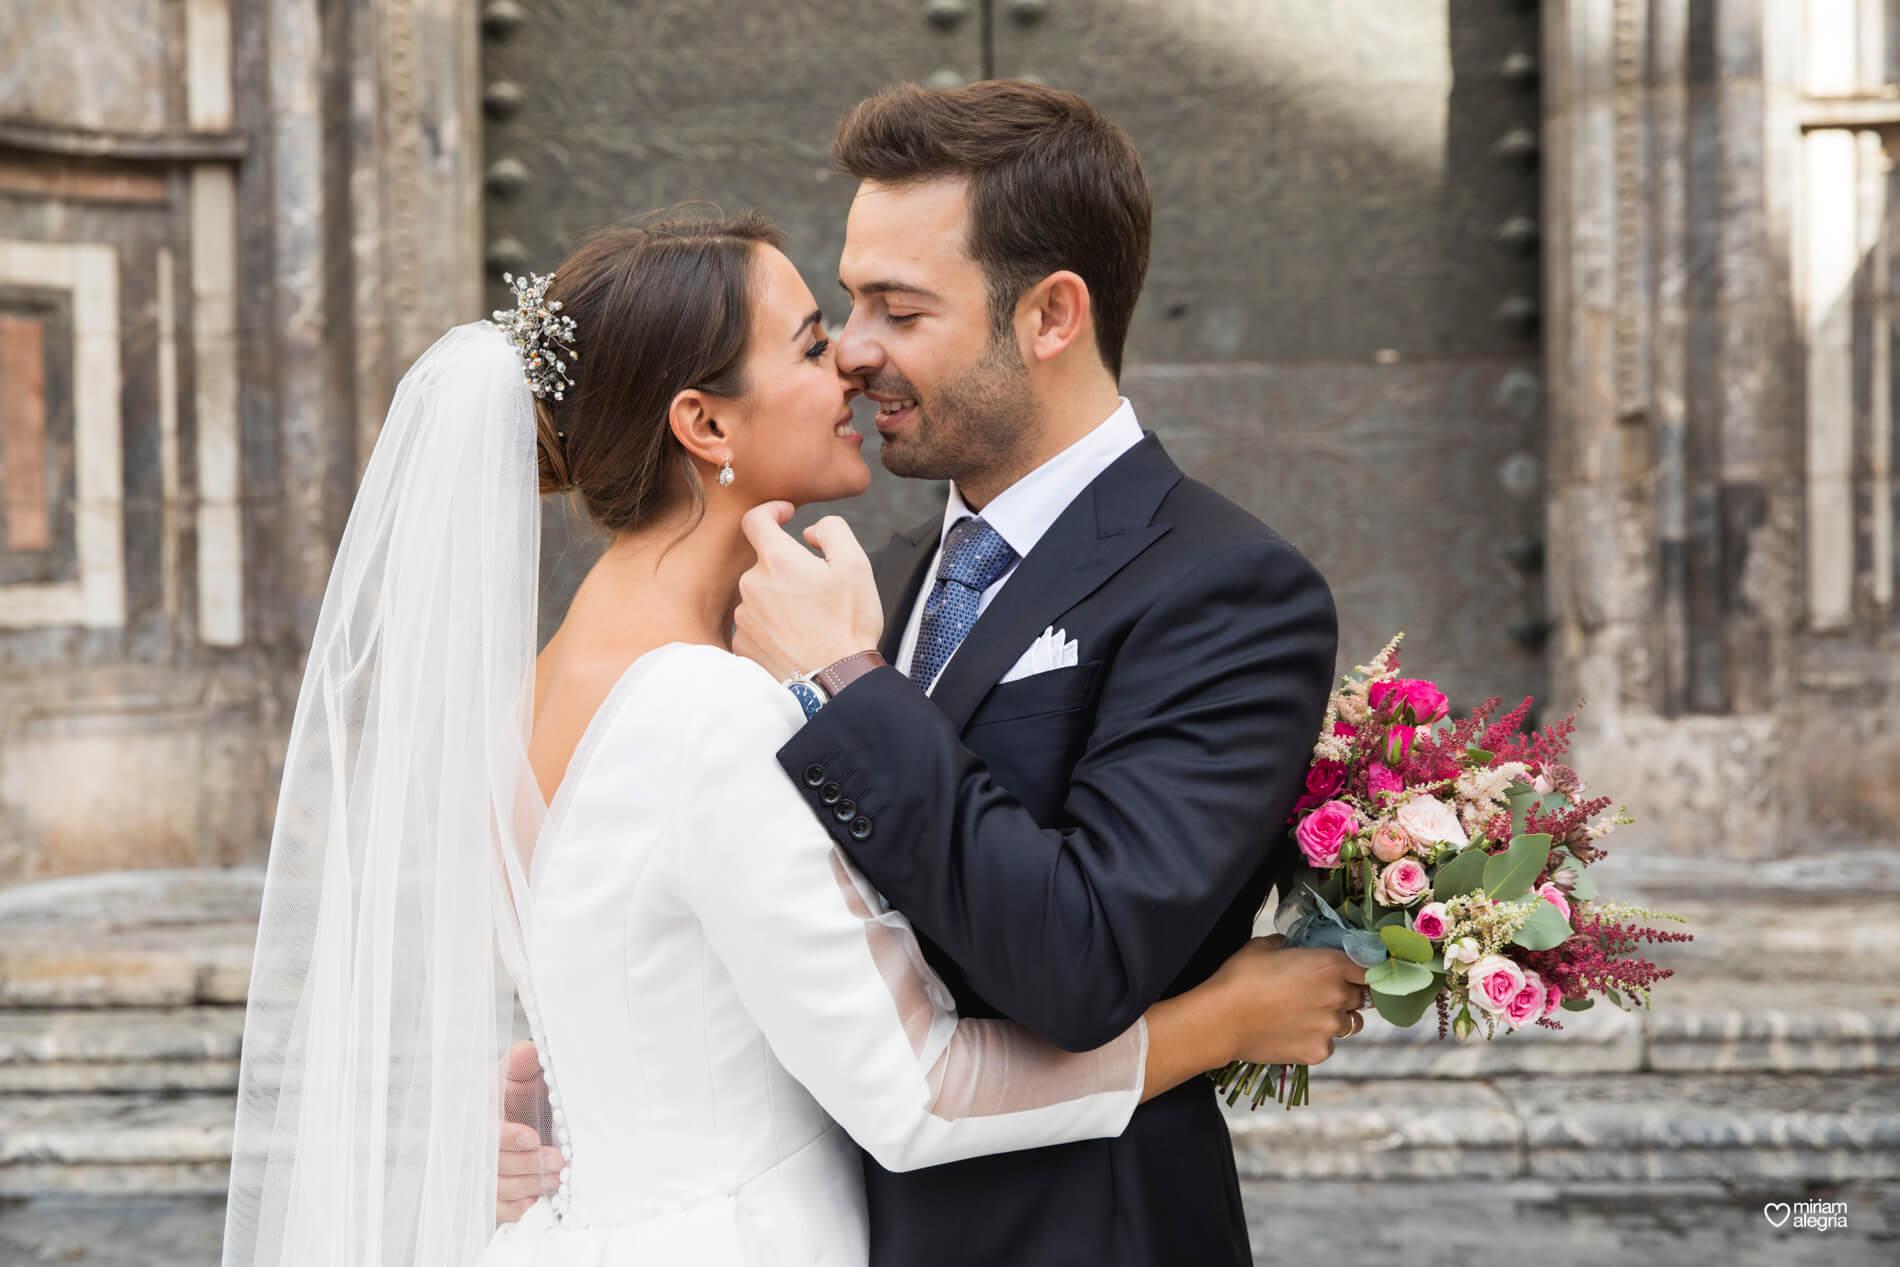 vestido-de-novia-paula-del-vas-miriam-alegria-fotografos-boda-murcia-91